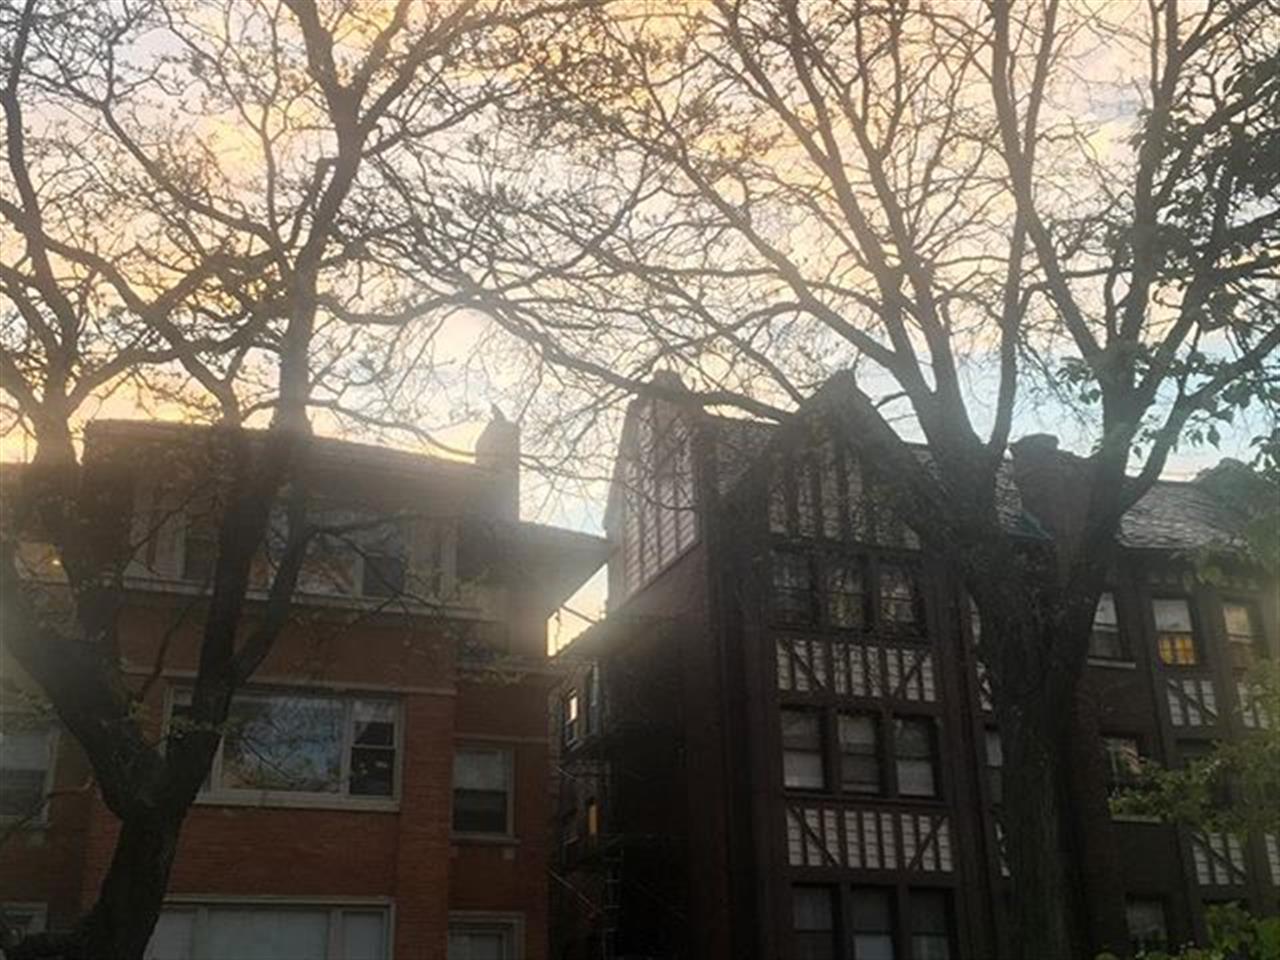 Tutor style in #edgewater #leadingrelocal #chicago #bairdwarner